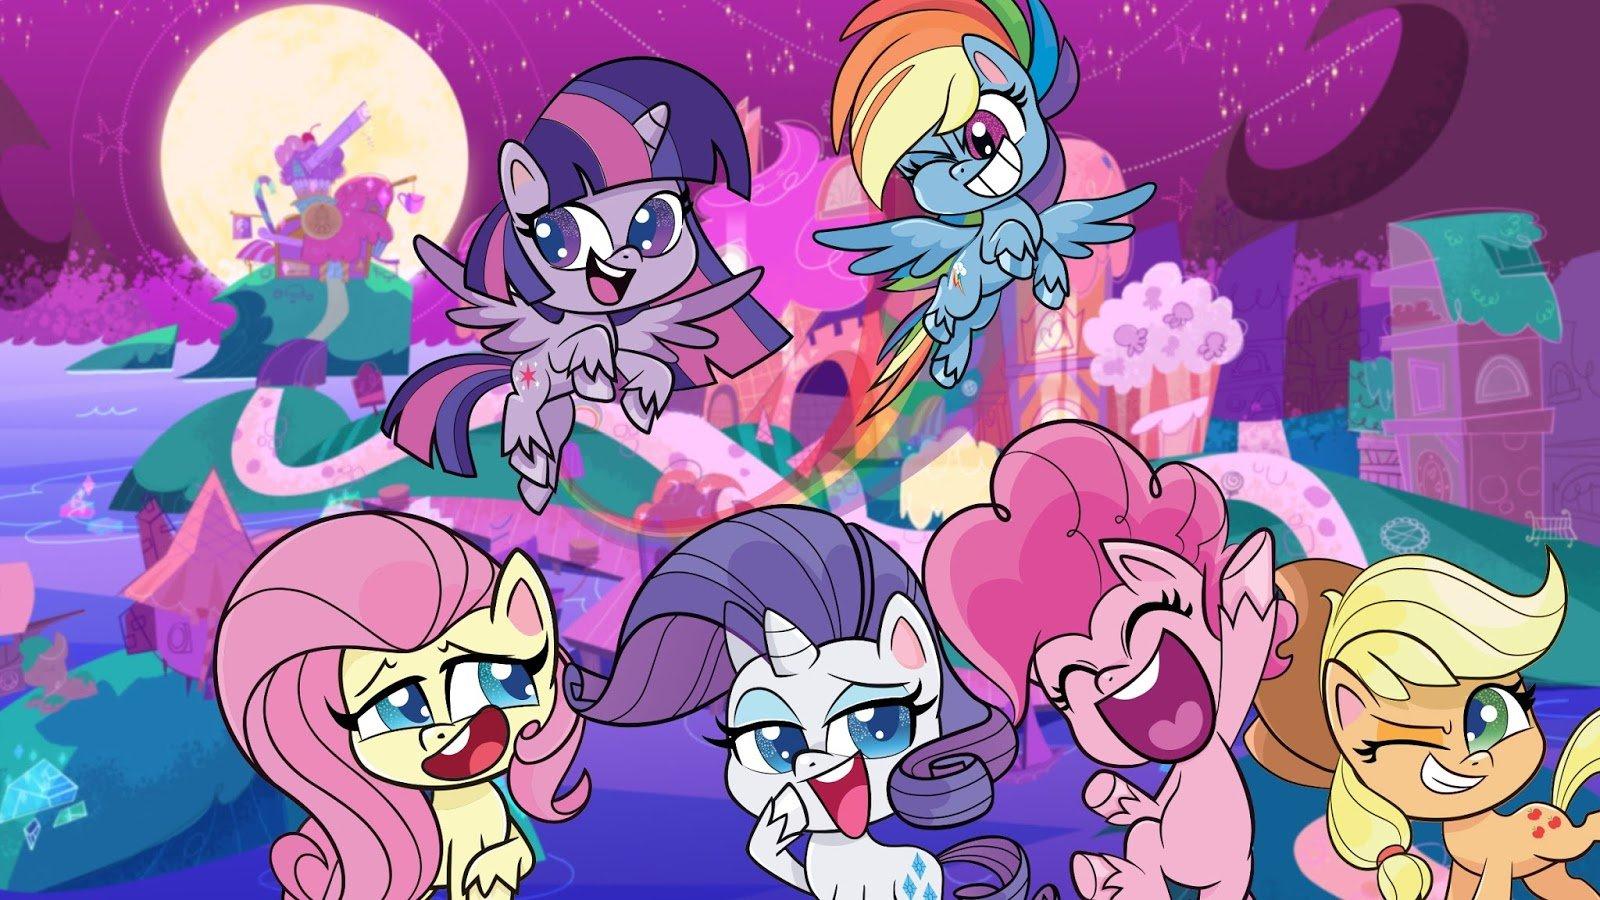 Аниме Пони Лайф / My Little Pony: Pony Life смотреть онлайн